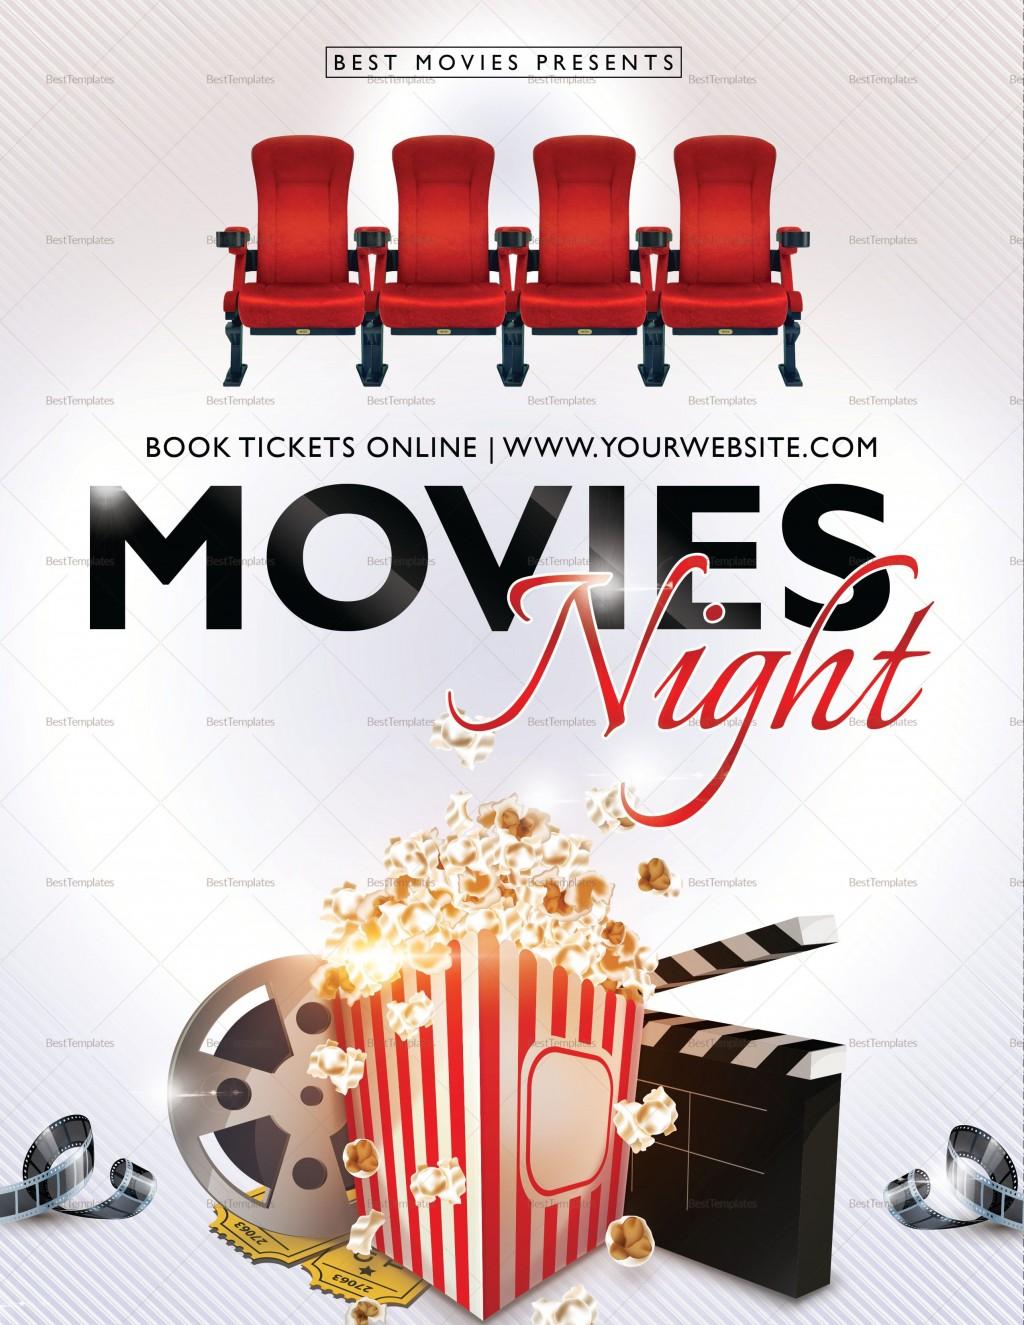 004 Frightening Movie Night Flyer Template Highest Quality  Templates Free Microsoft WordLarge